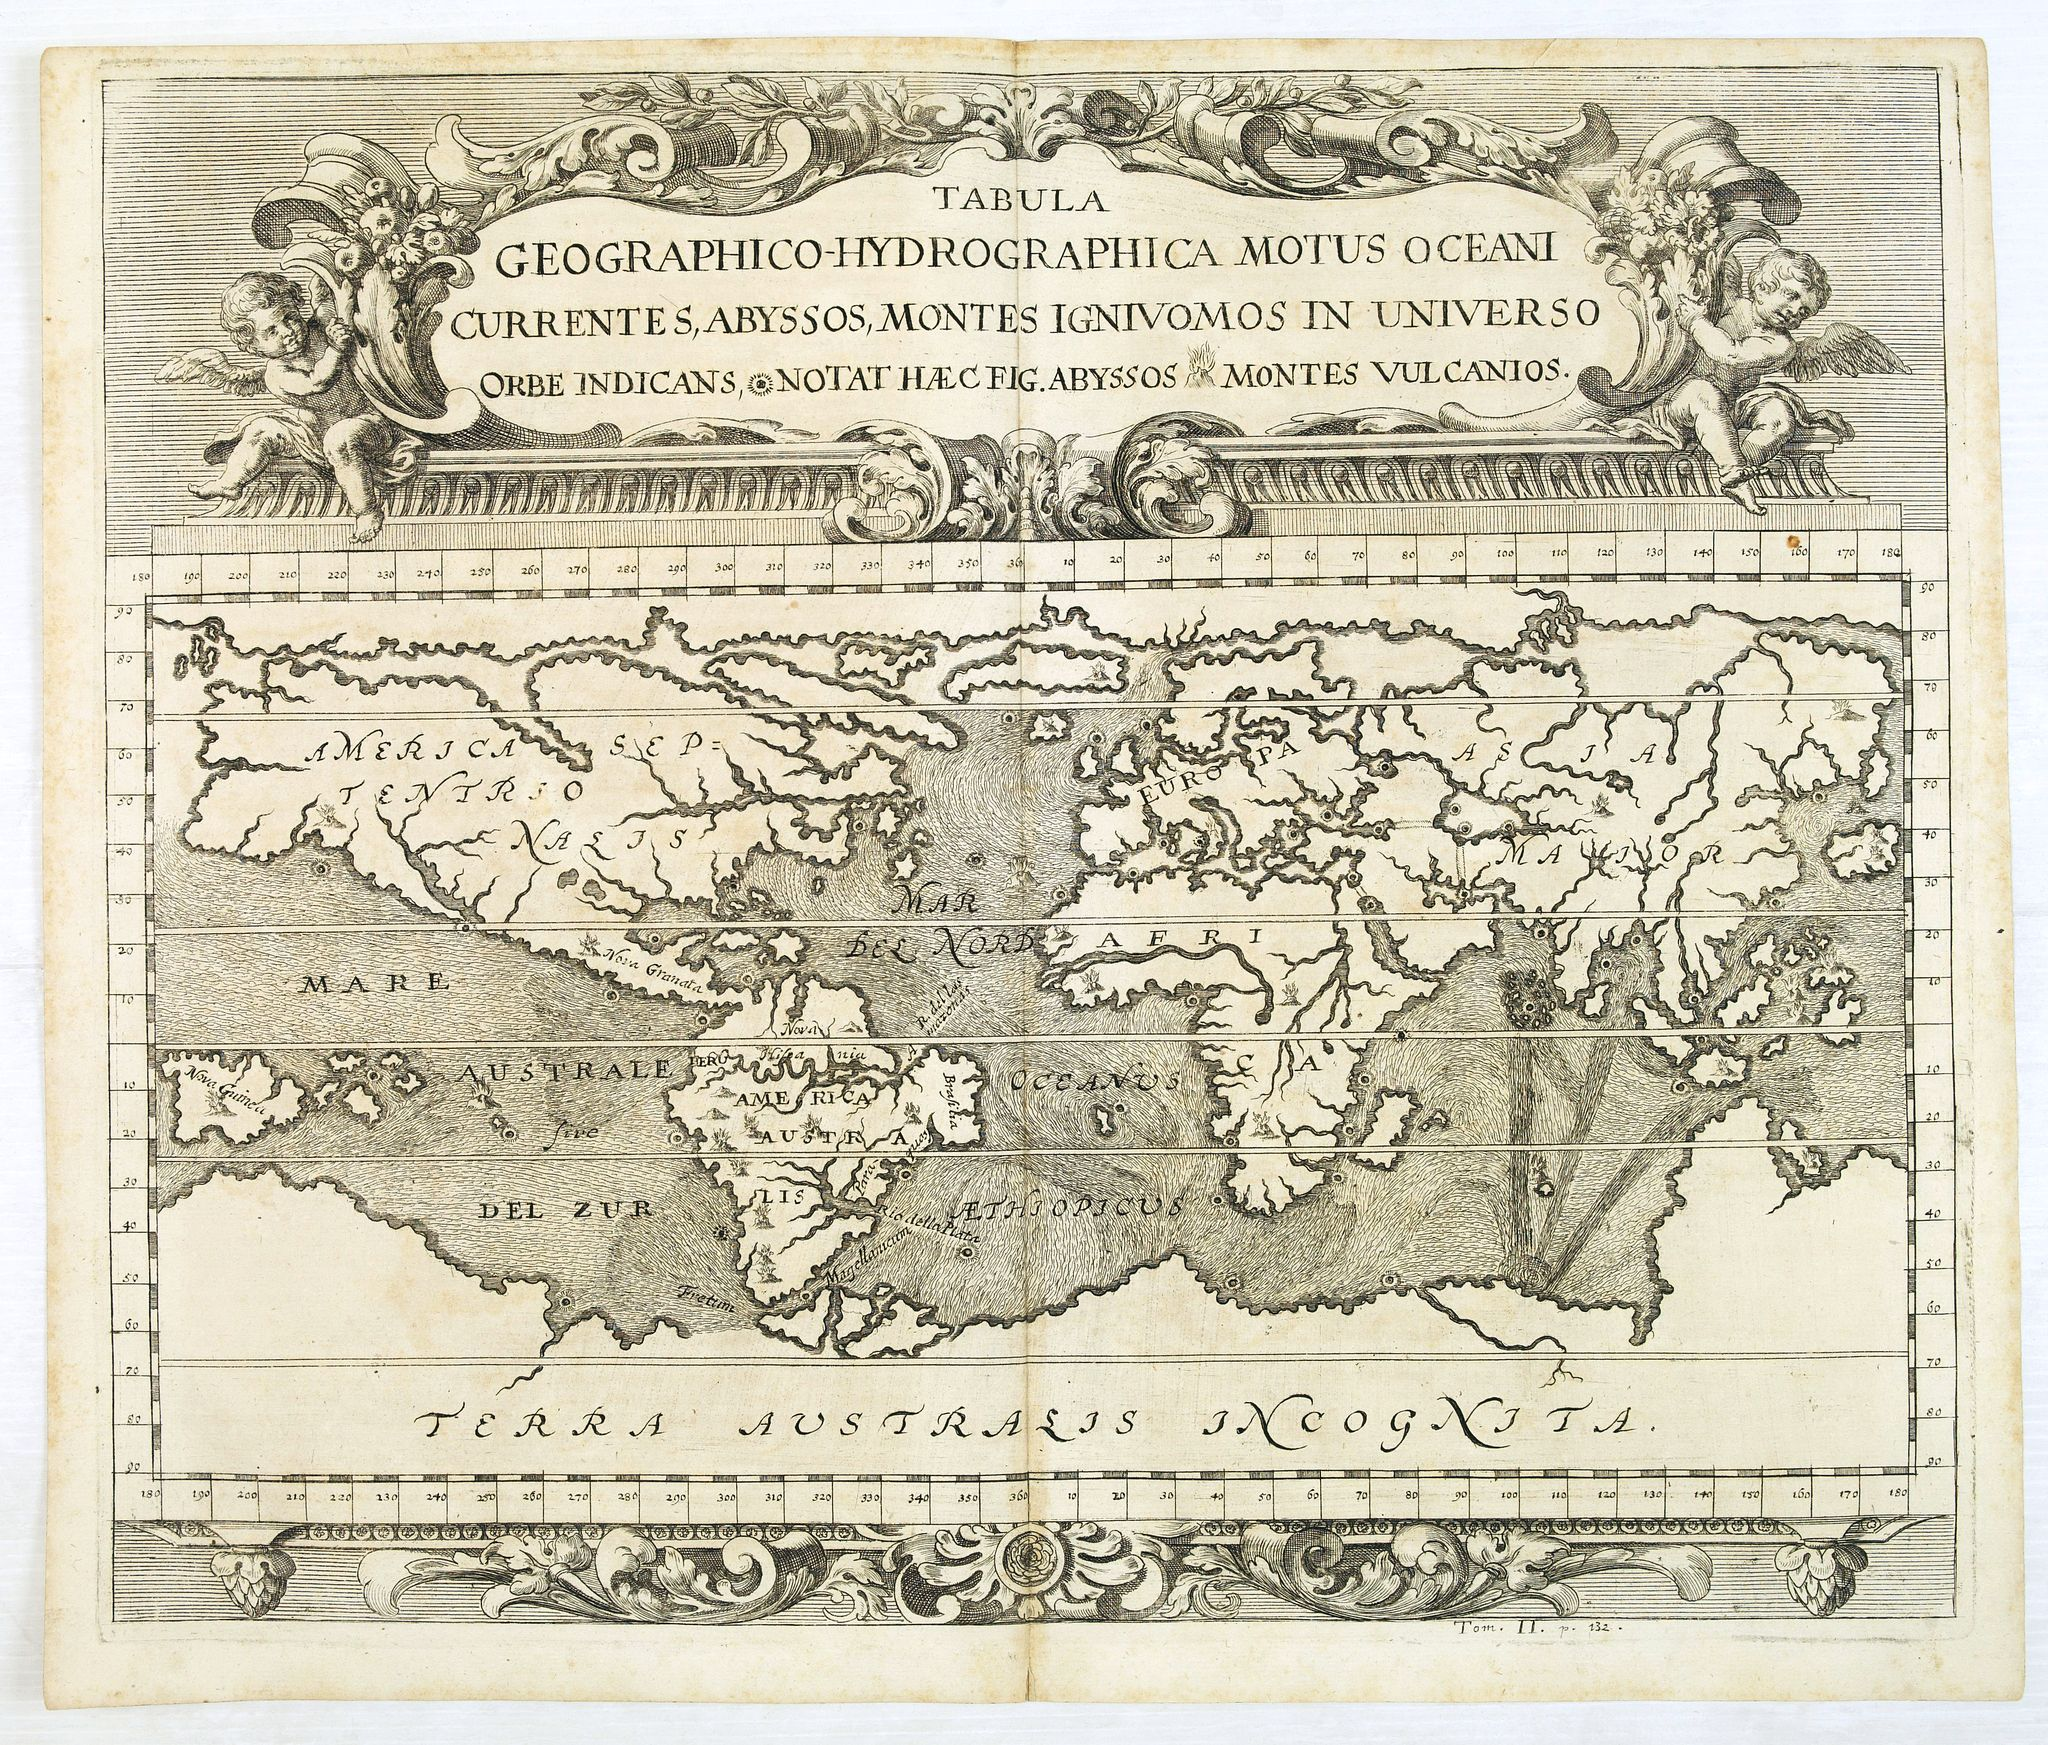 ZAHN, J. -  Tabula geographico-hydrographica motus Tom II p.132.